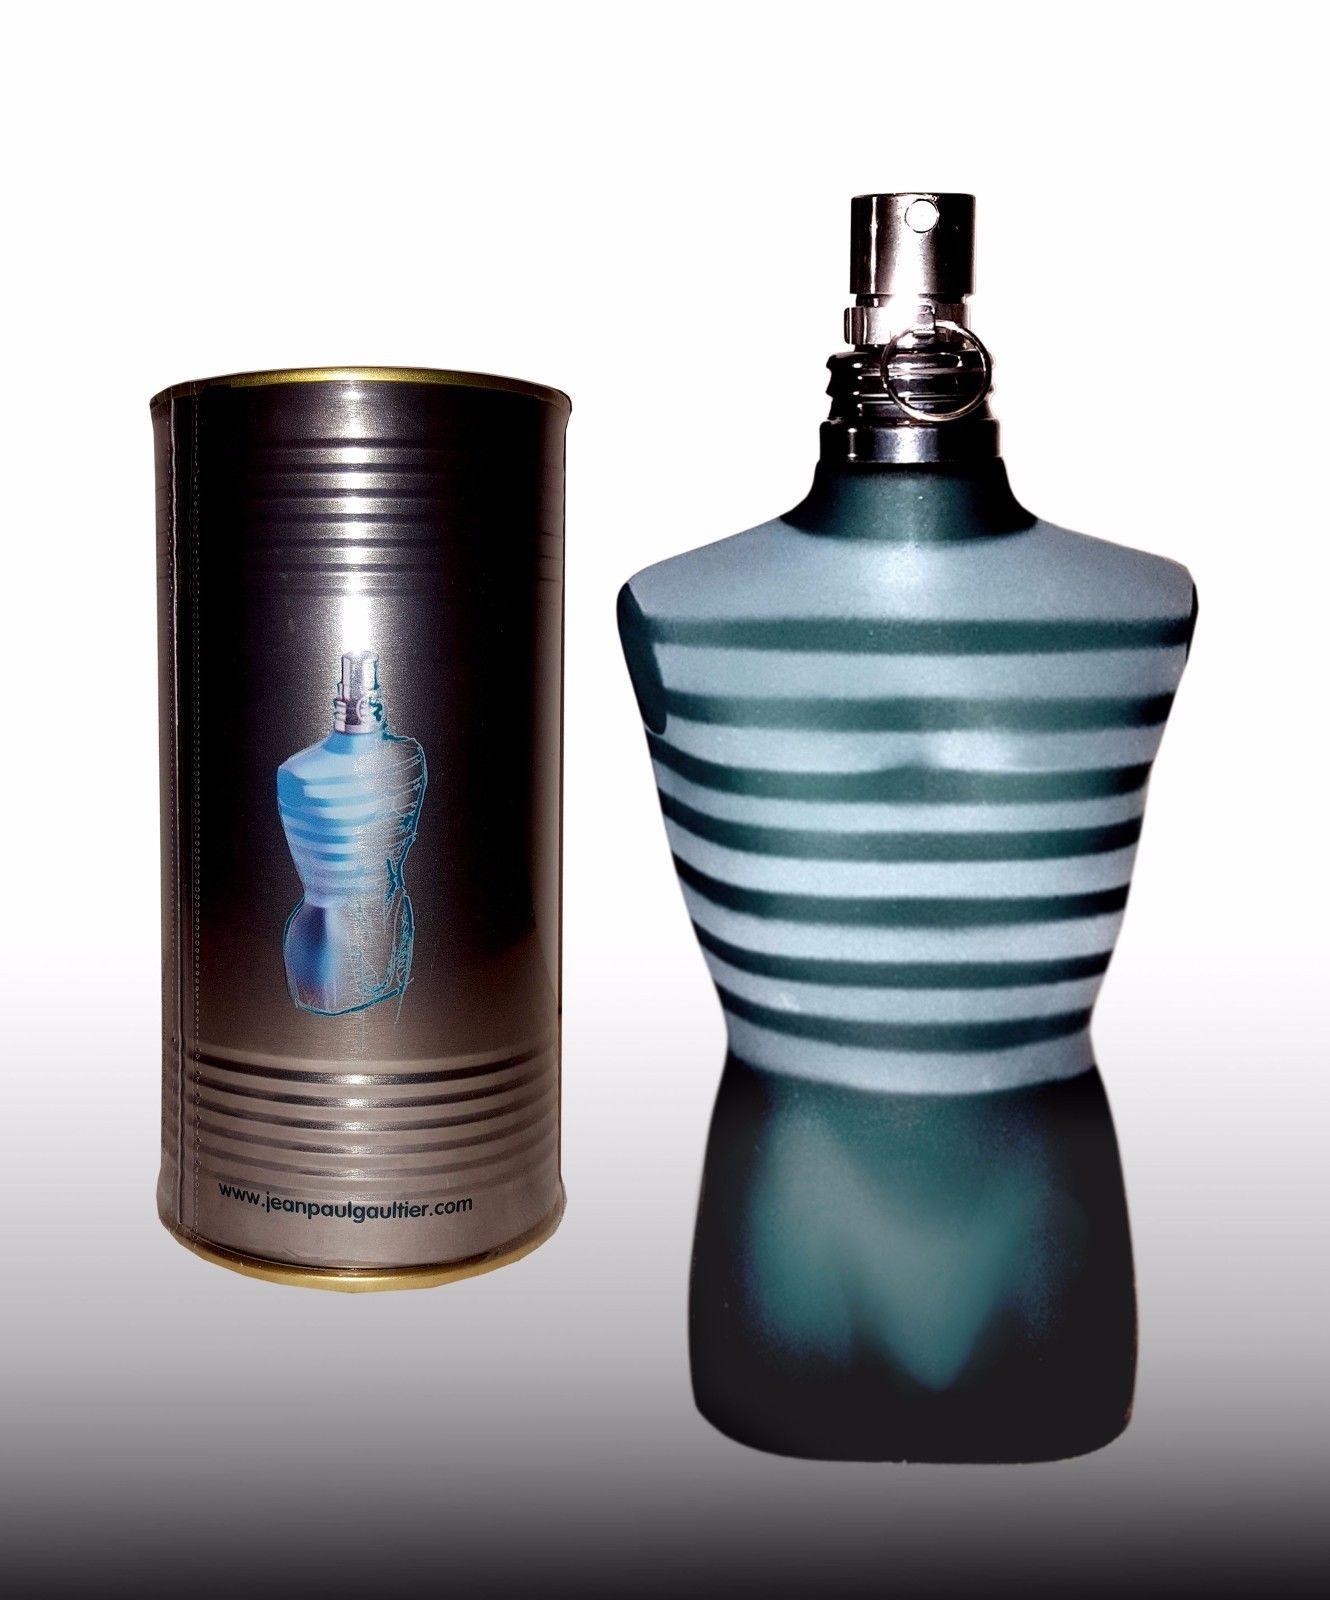 Jean Paul Gaultier Le Male Men / 125 ml  EDT EU WARE Vapo neu& Originalverpackt